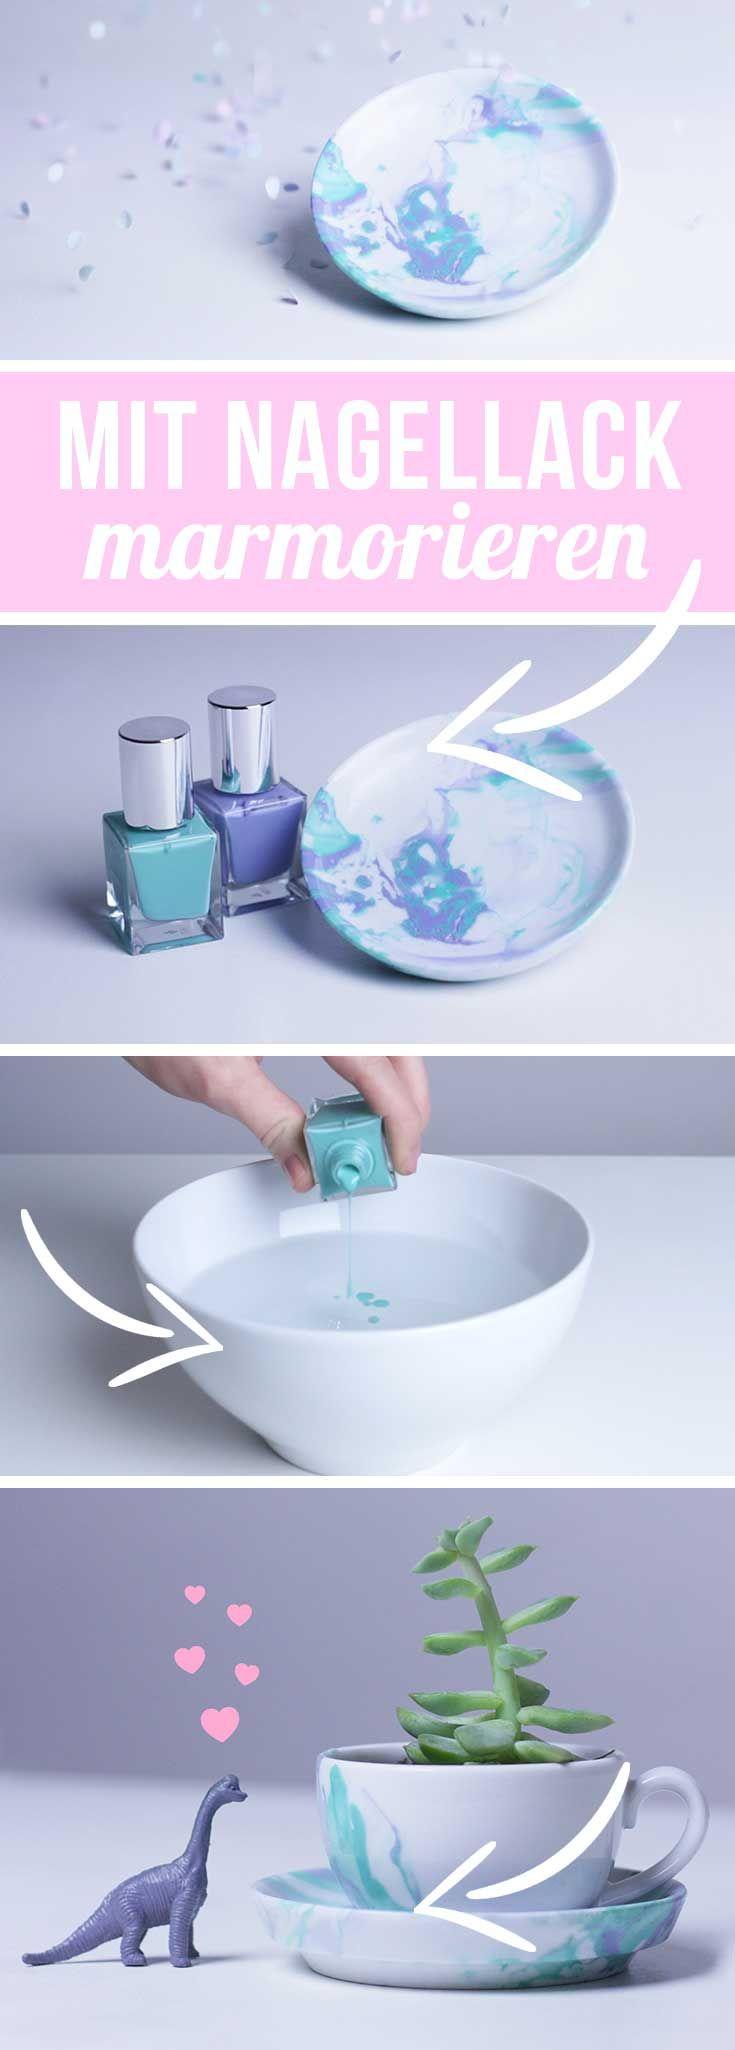 Marmorieren mit Nagellack – Anleitung Tasse Marmor DIY Geschenkidee – Ideen